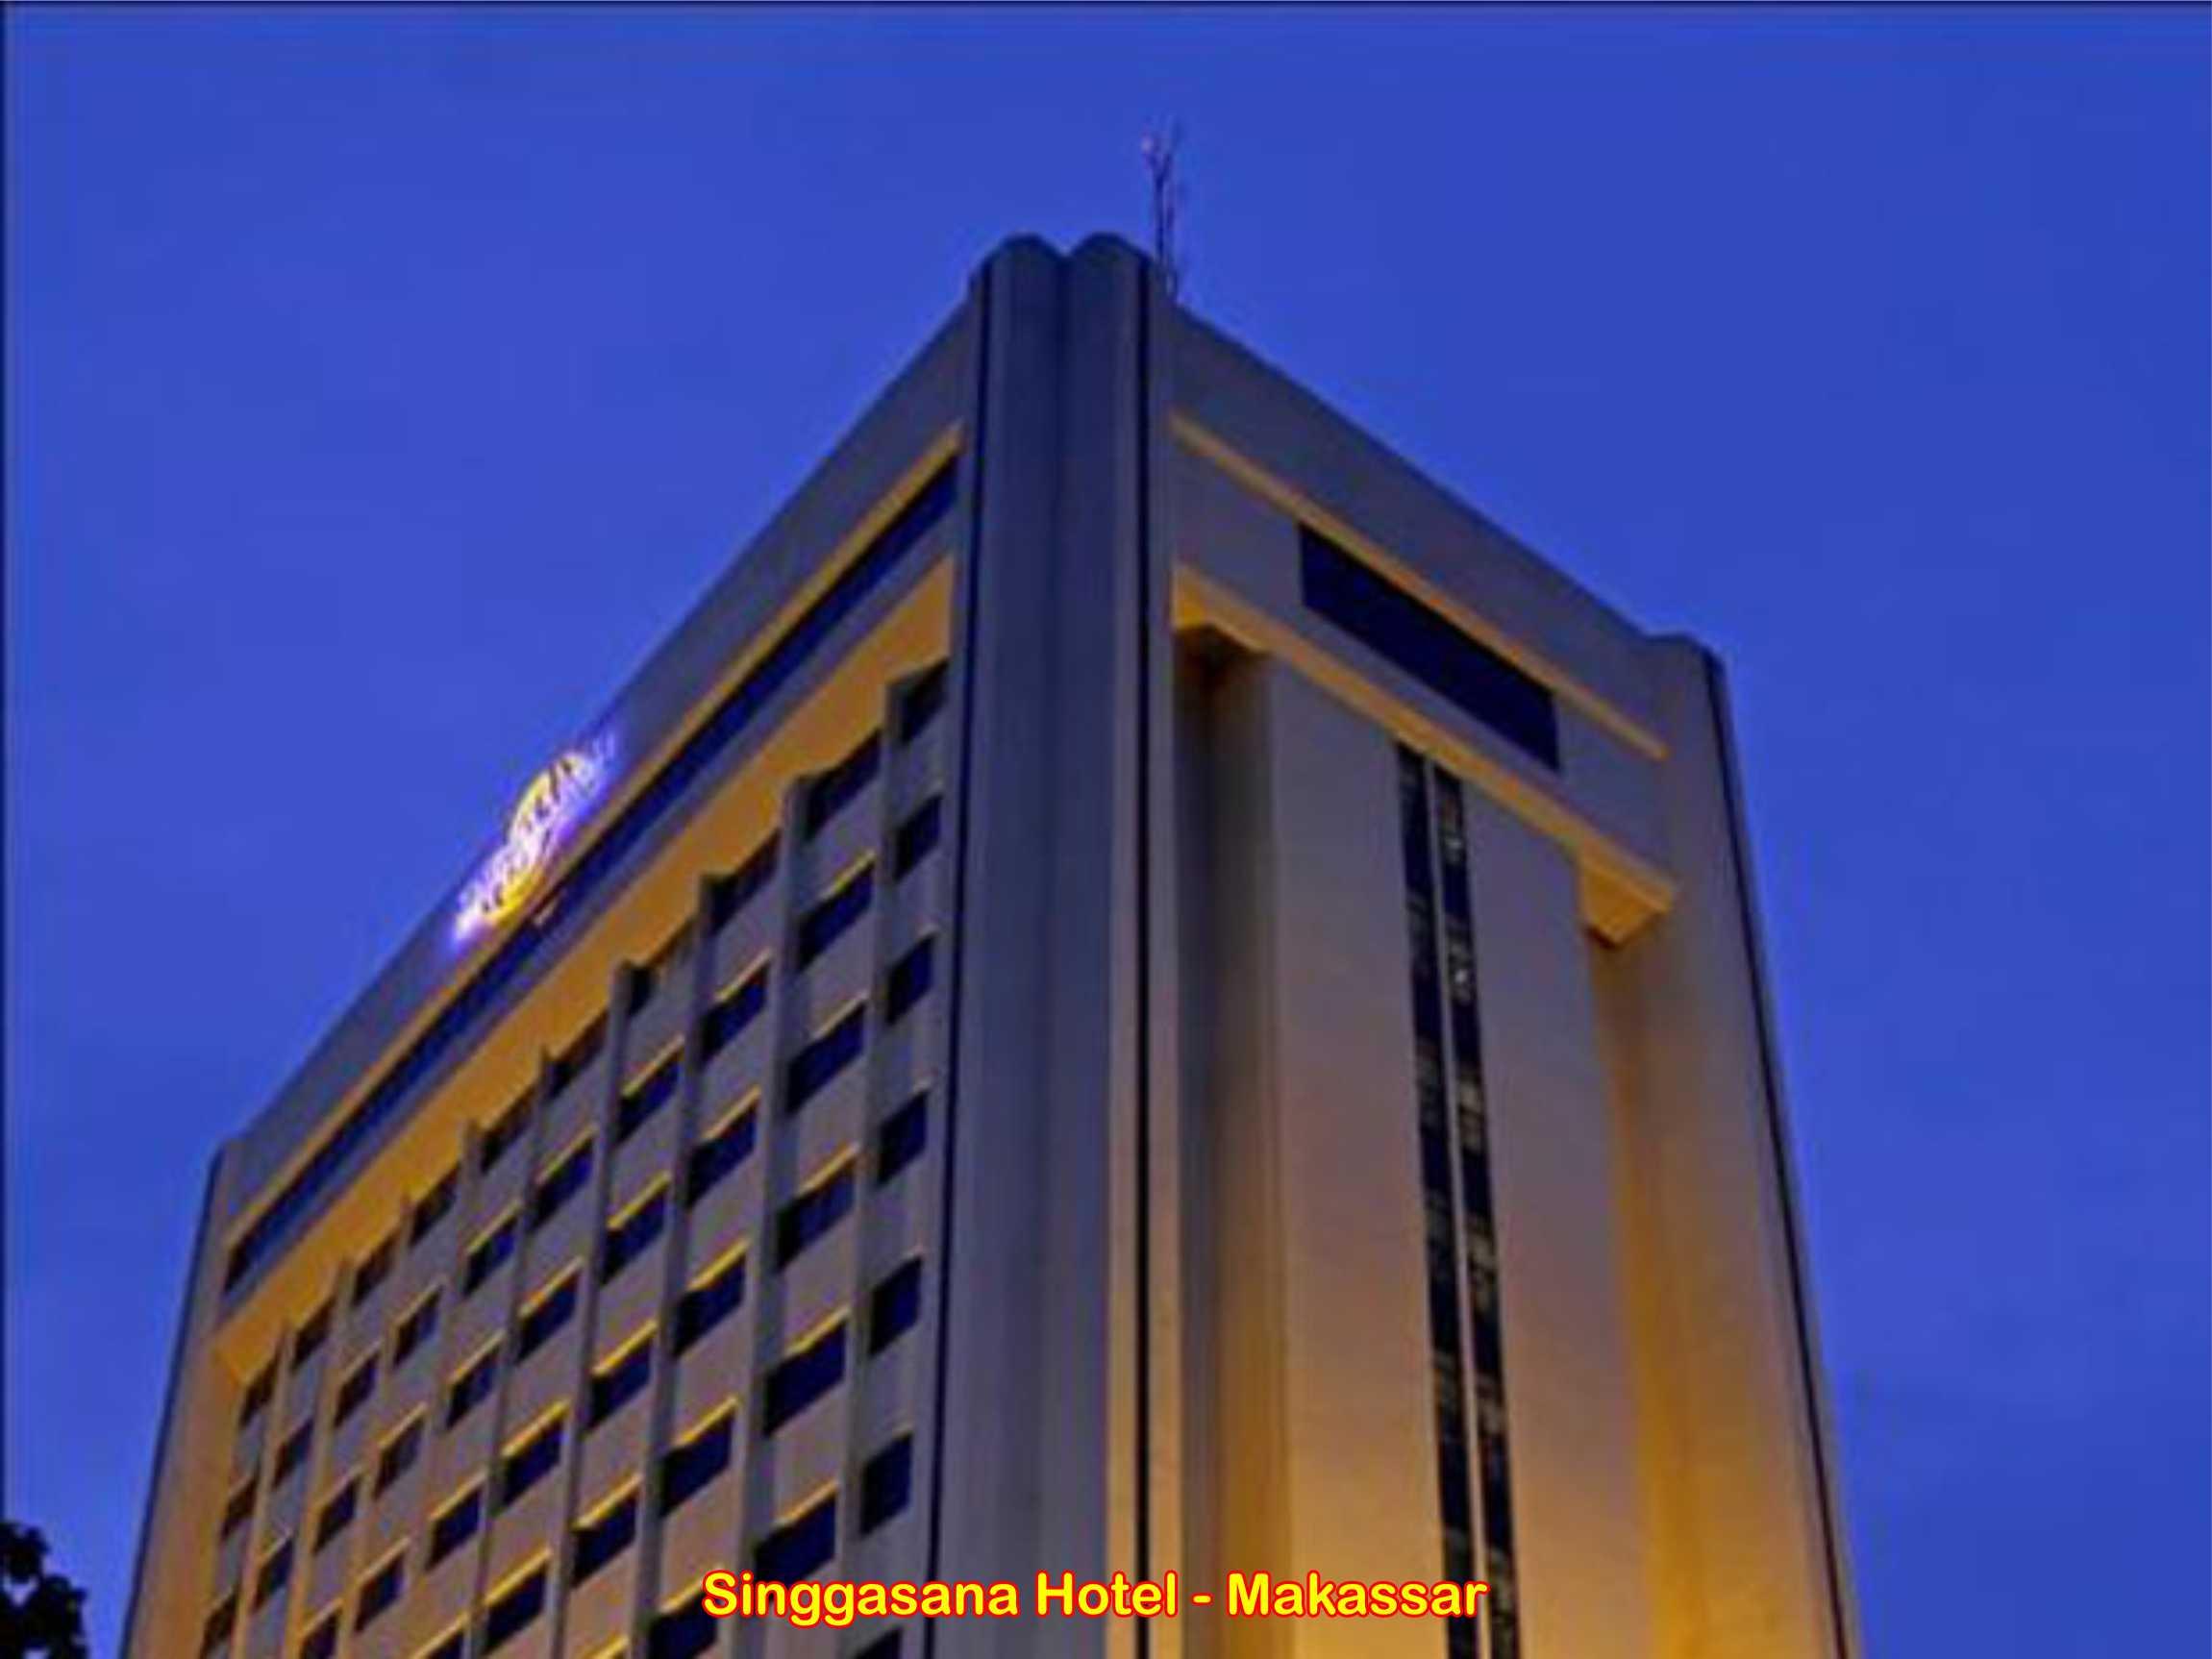 Hotel Singgasana, Makassar - Indonesia 1